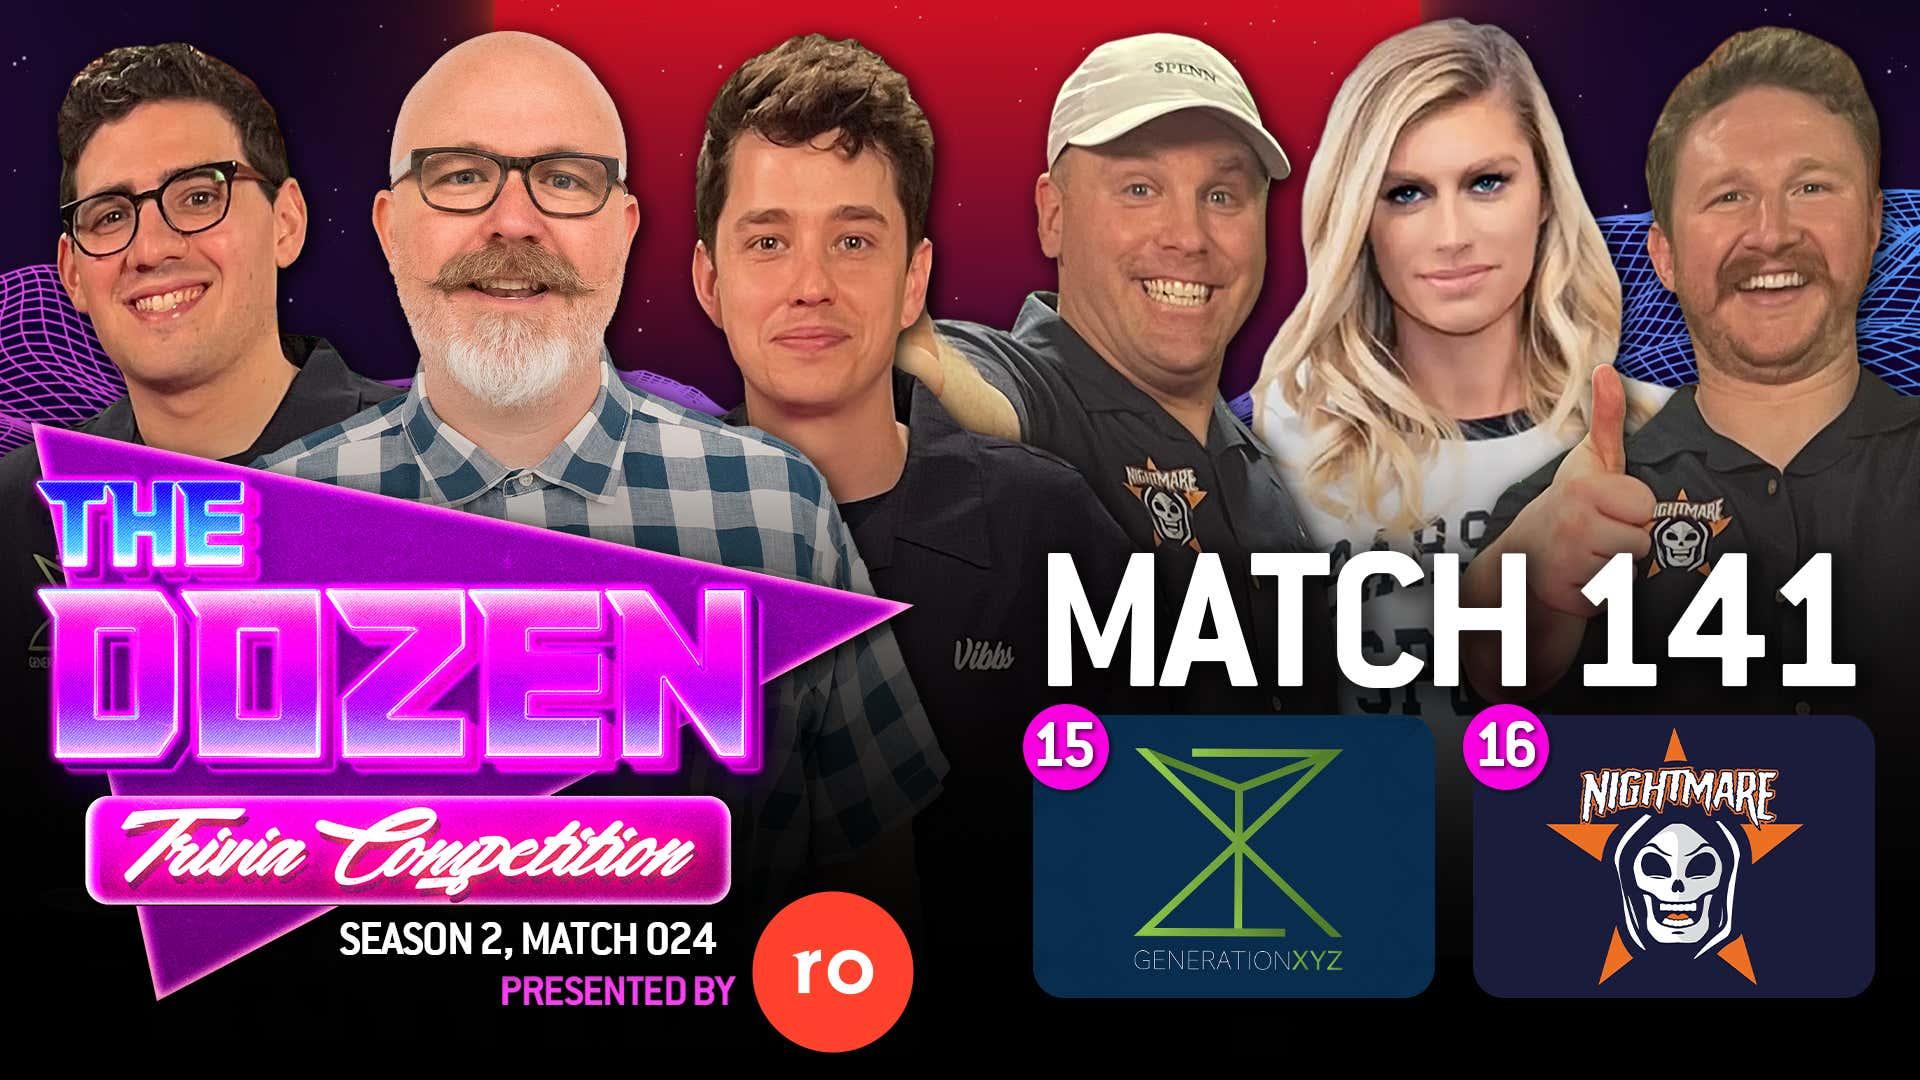 15-Gen XYZ vs. 16-Nightmare (The Dozen: Trivia Competition pres. by Roman, Match 141)